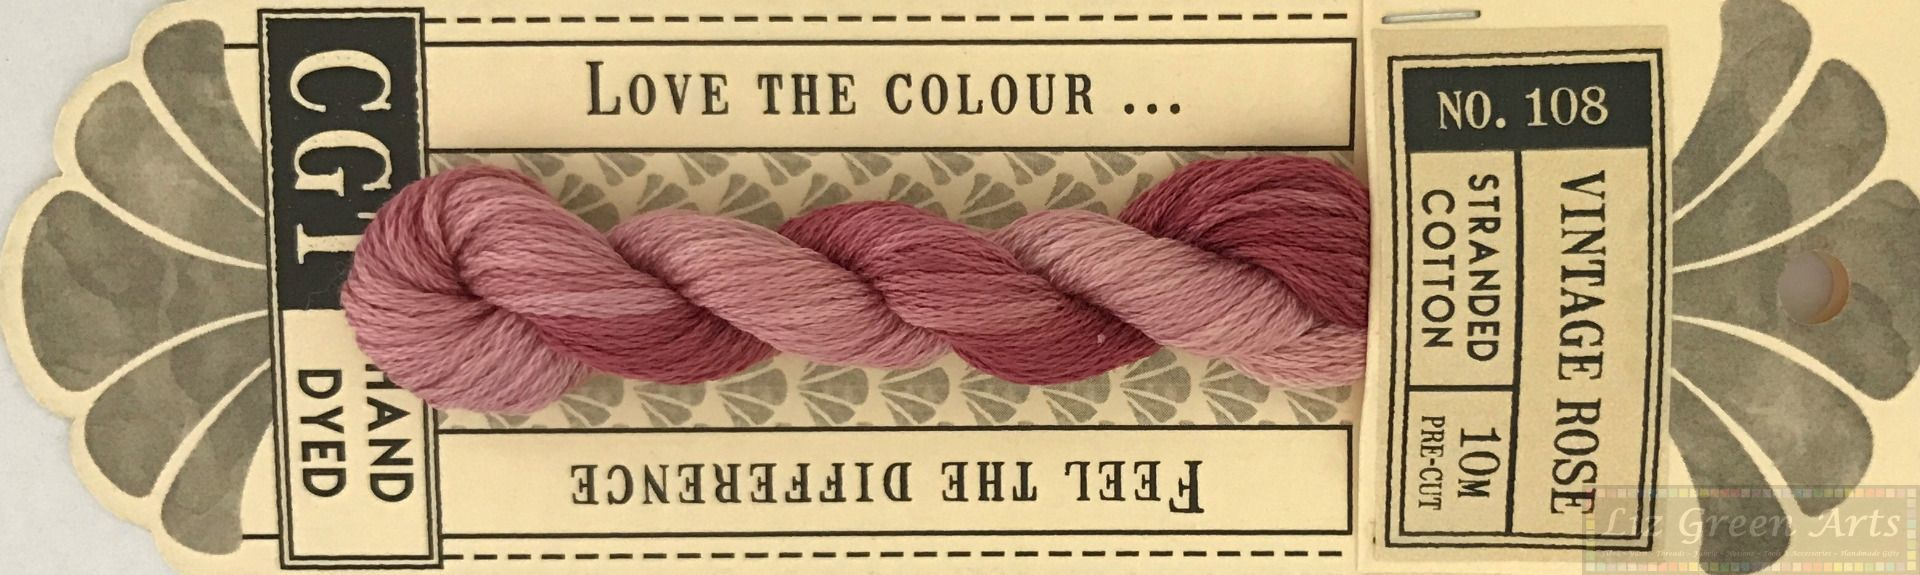 Borduurwol - Emboidery wool